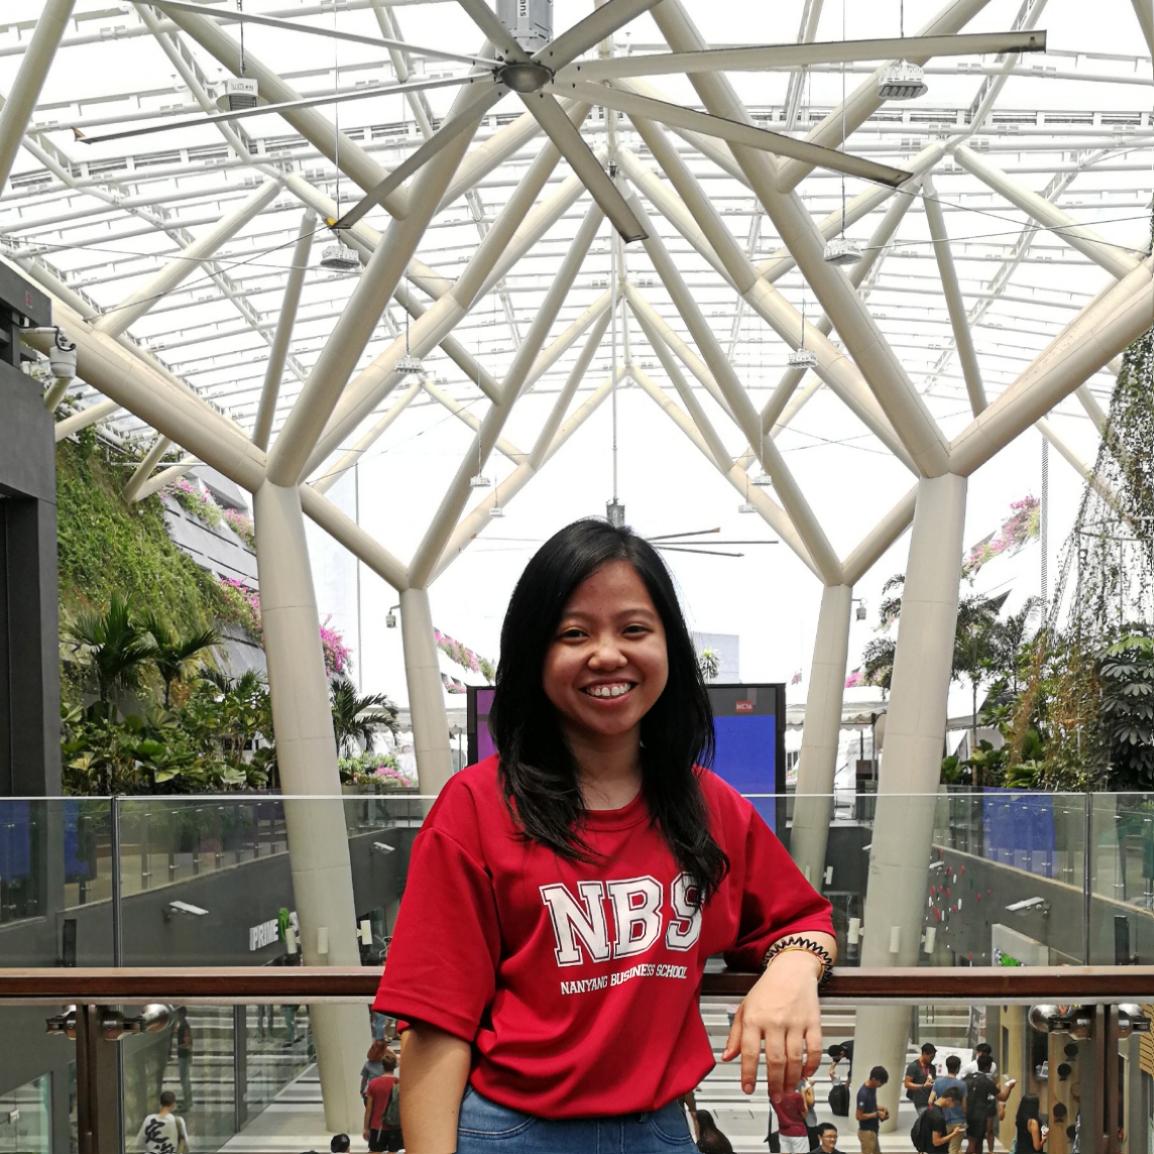 Shopee Career eCommerce Singapore Interview Lifeatshopee Auyong Yu Lin Enactus NTU Social Entrepreneurship Intute Nanyang Business School